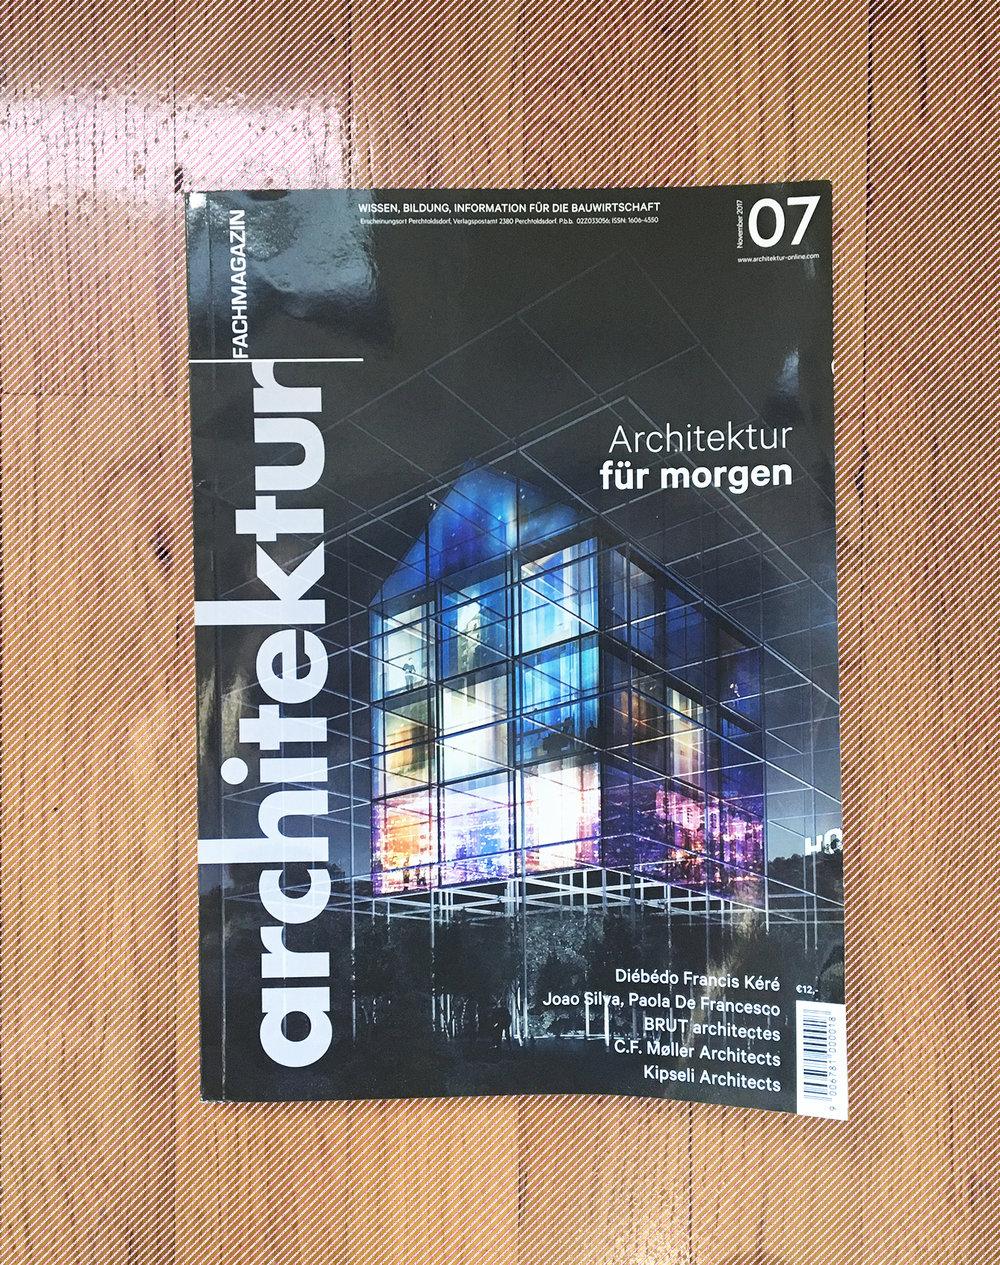 architektur-cover.jpg